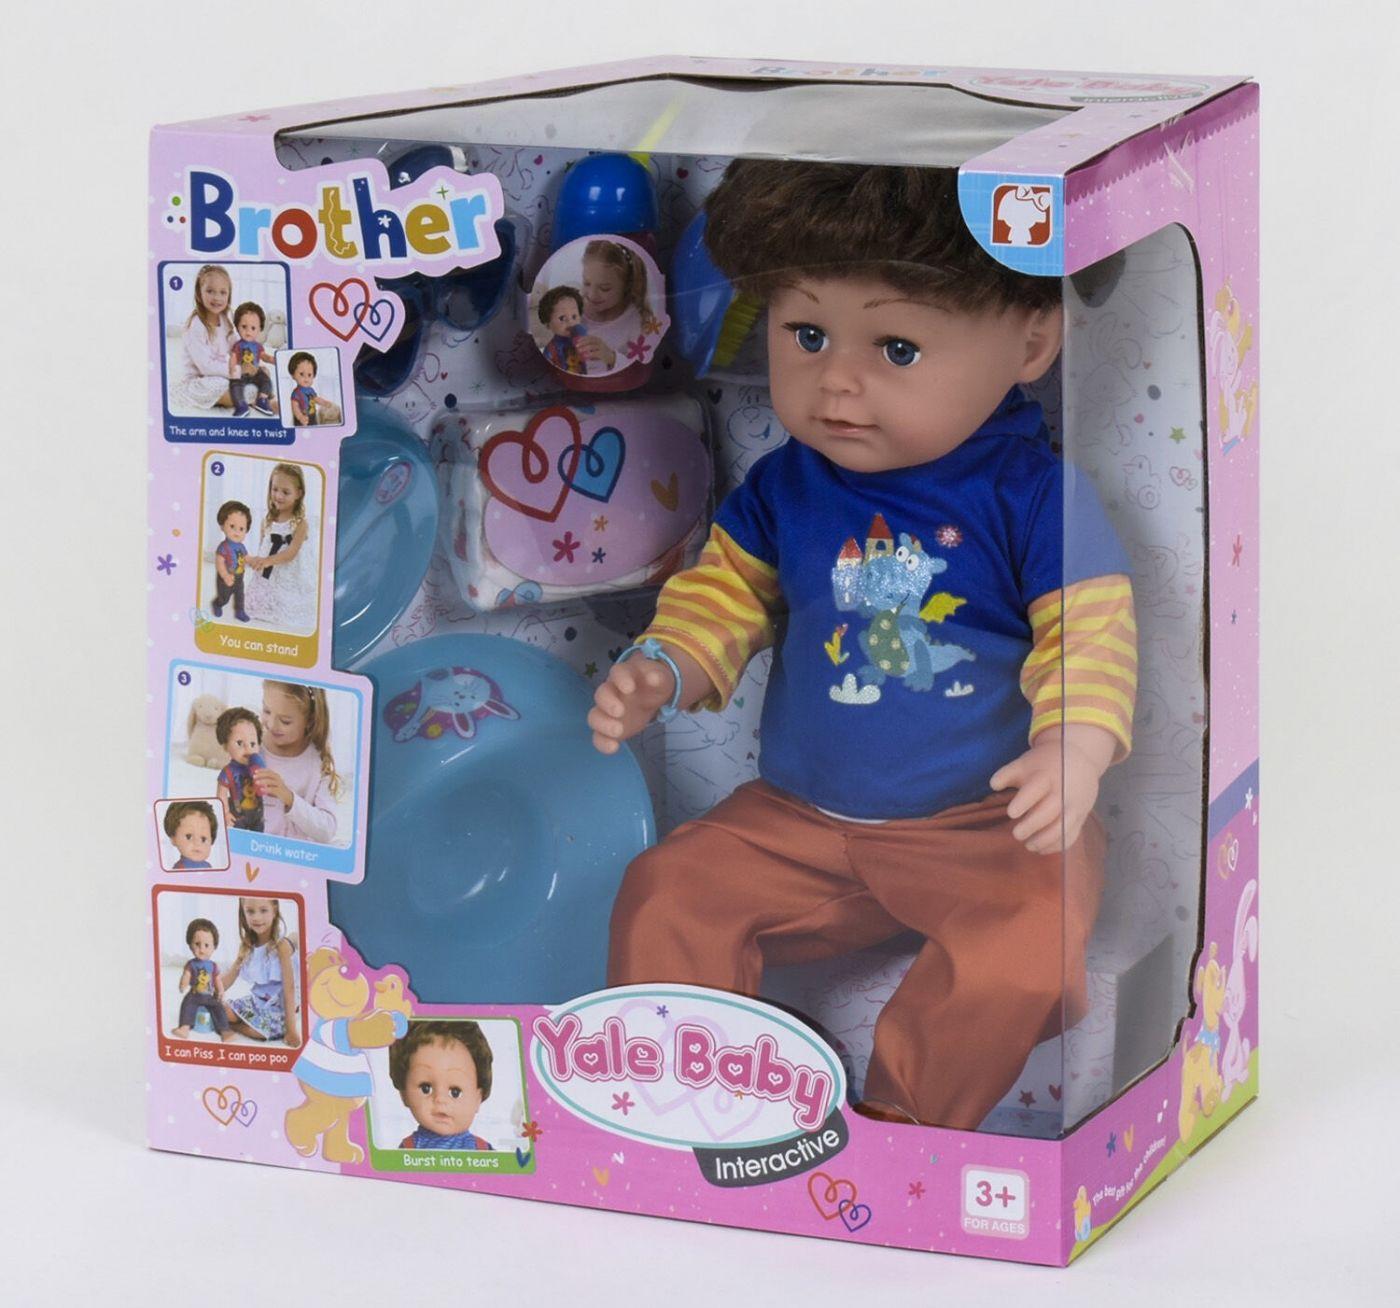 Кукла пупс Baby doll Brother брат интерактивный (BLB001C)